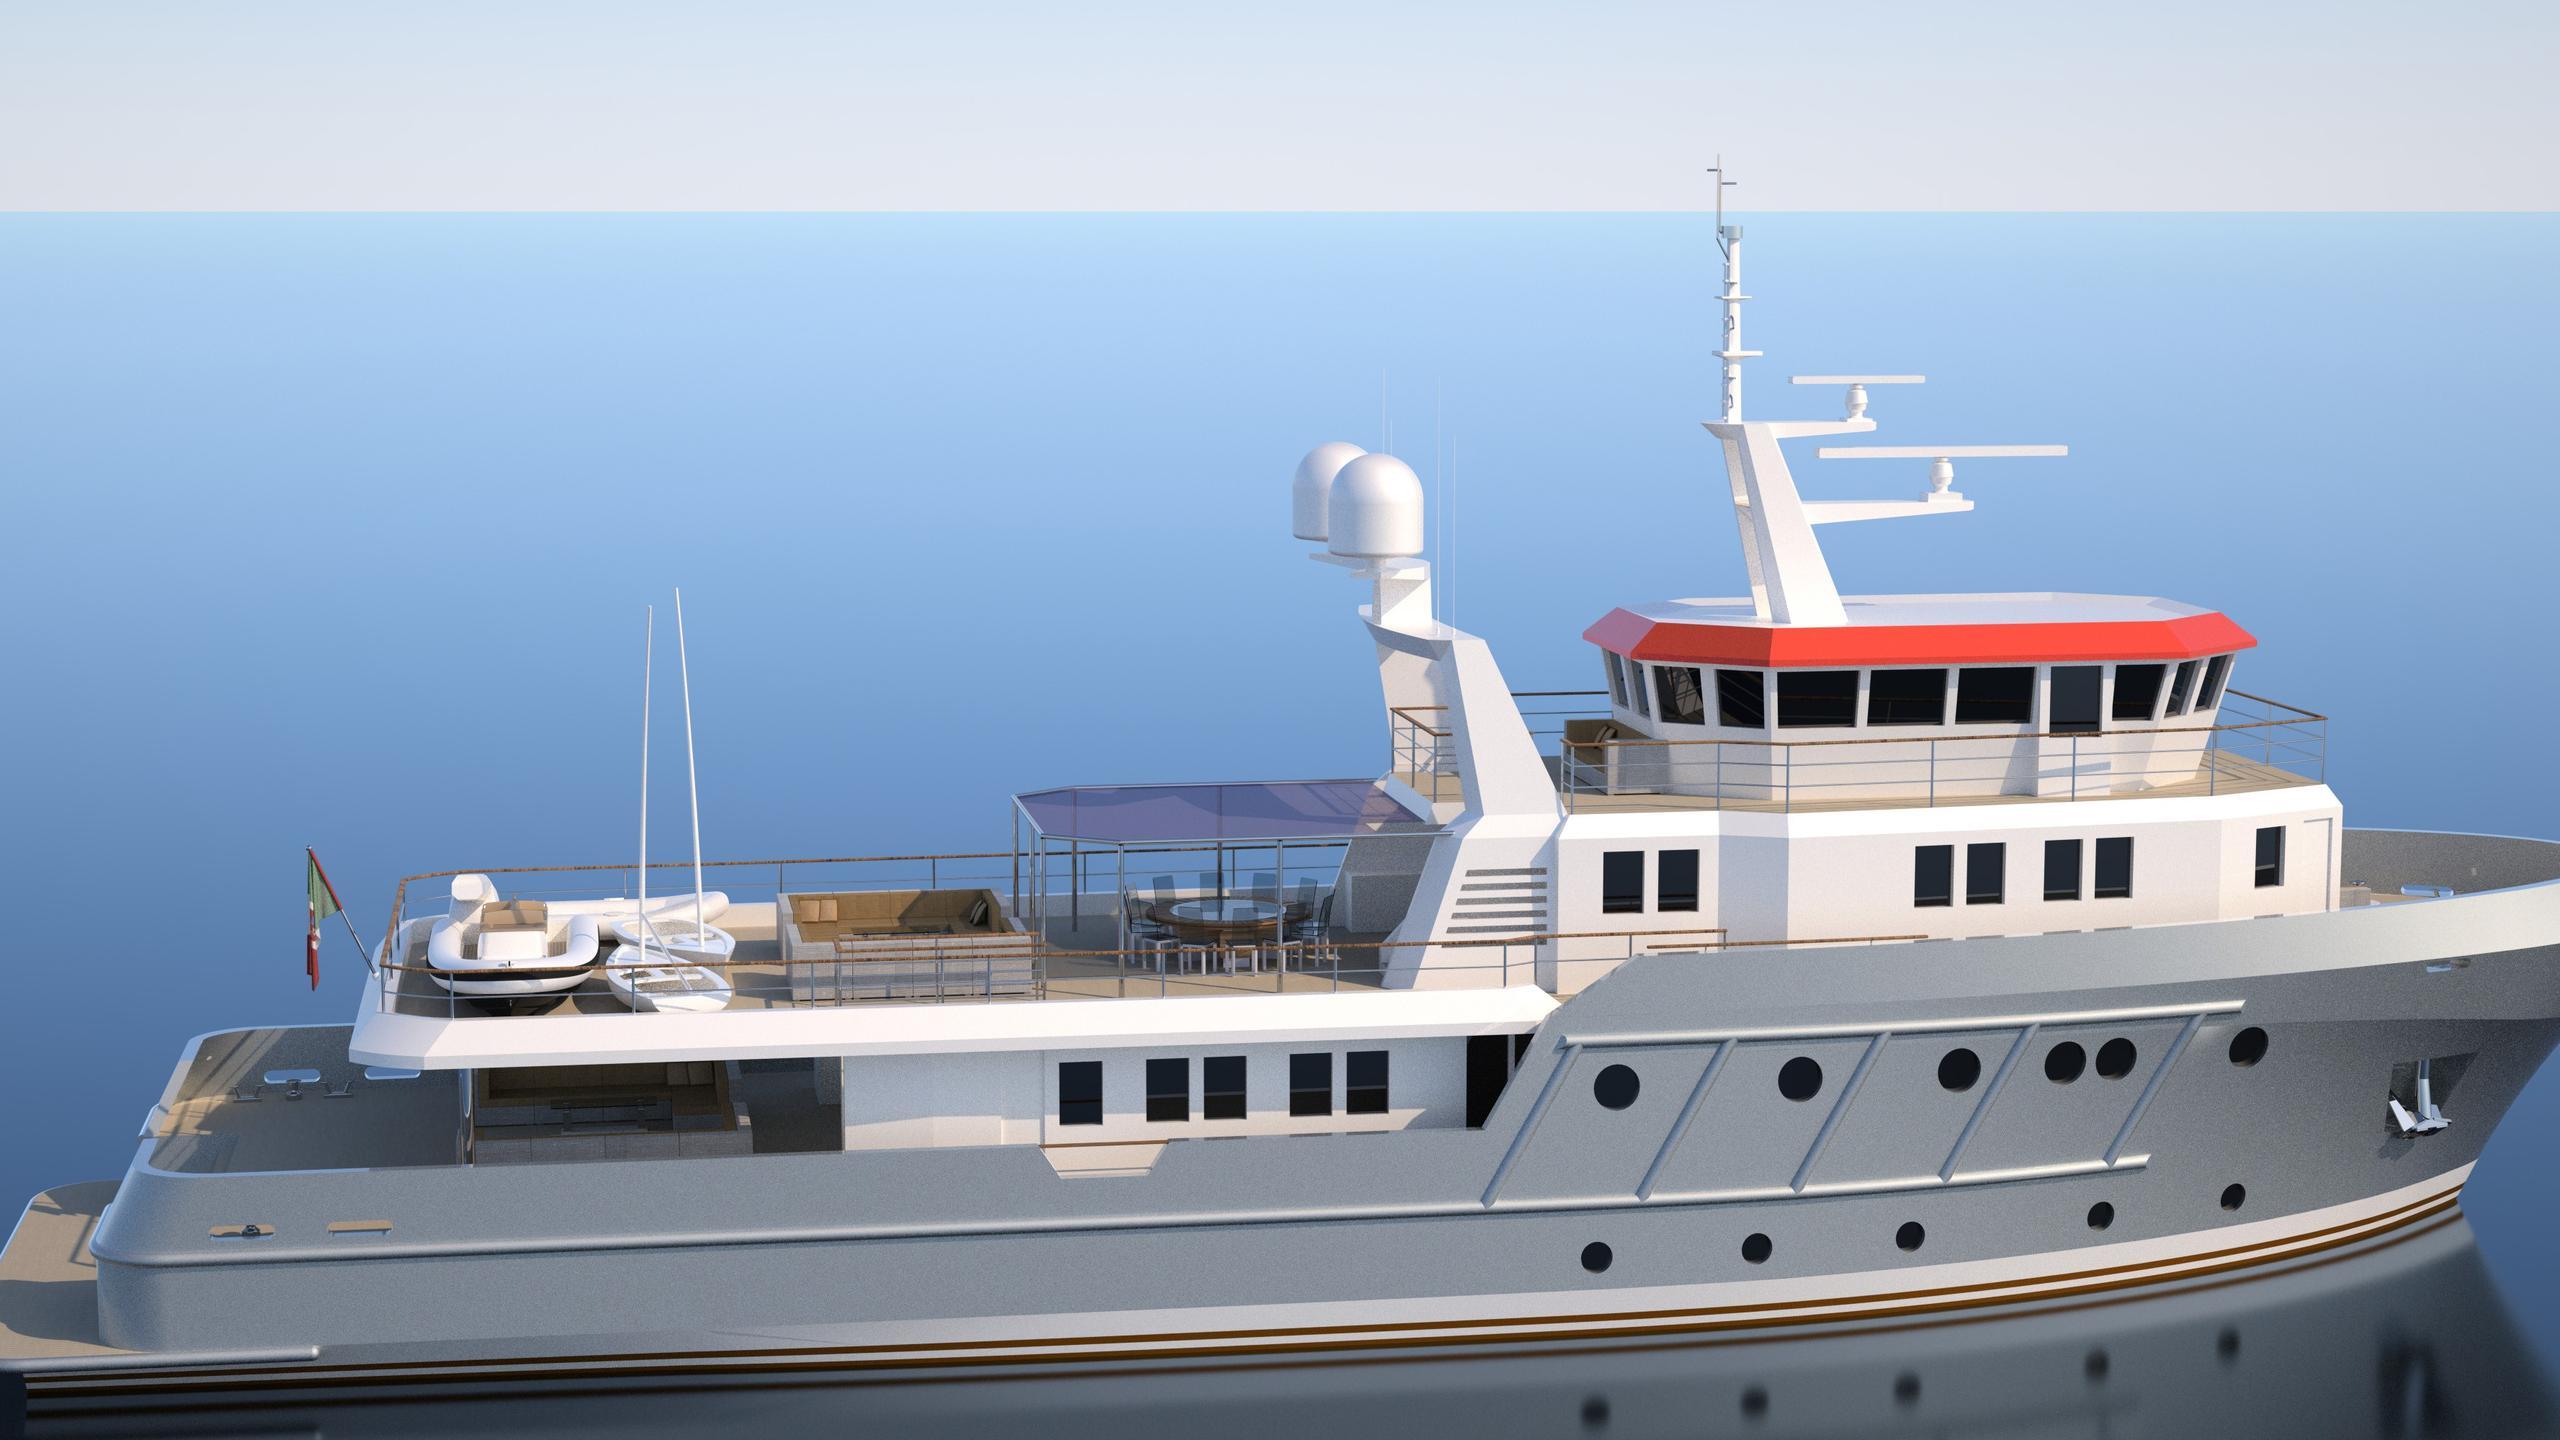 genesia motoryacht chioggia ocean king 130 yacht exterior rendering profile